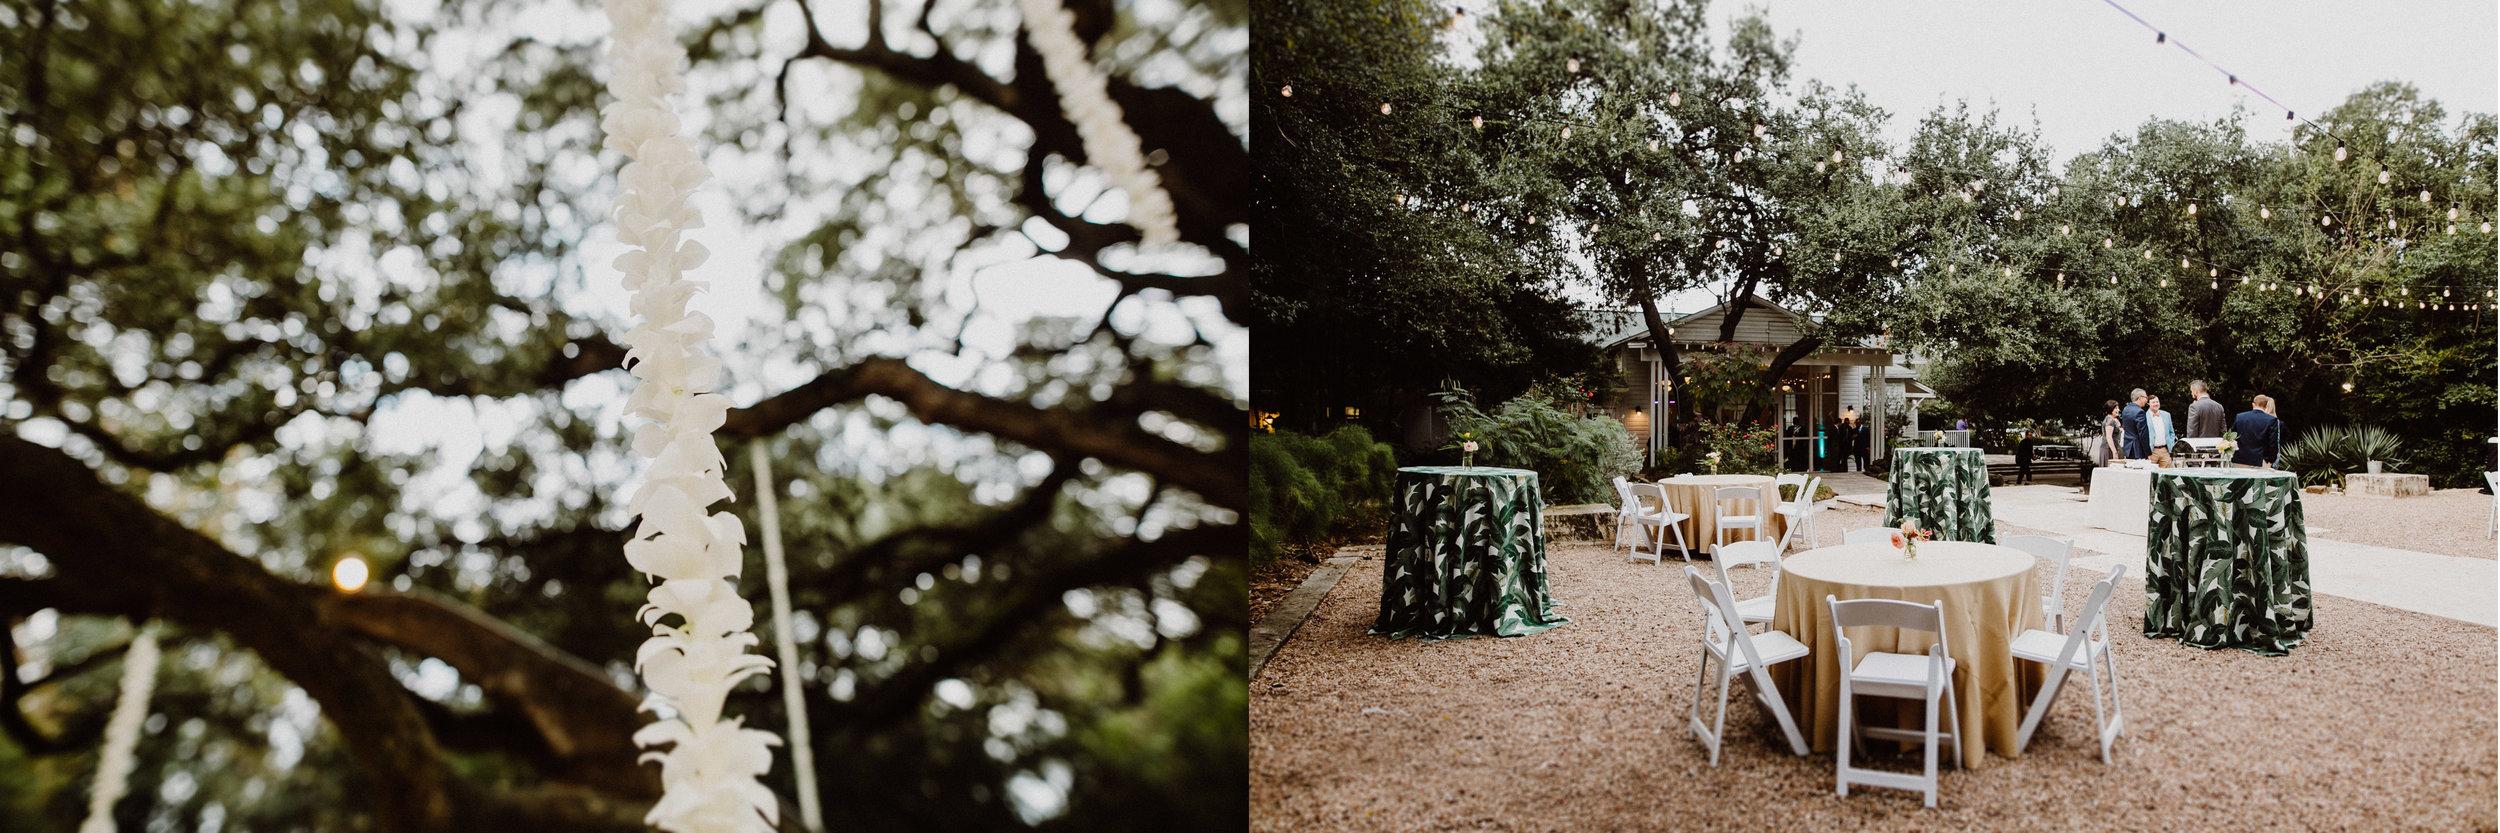 mercury-hall-wedding-9.jpg